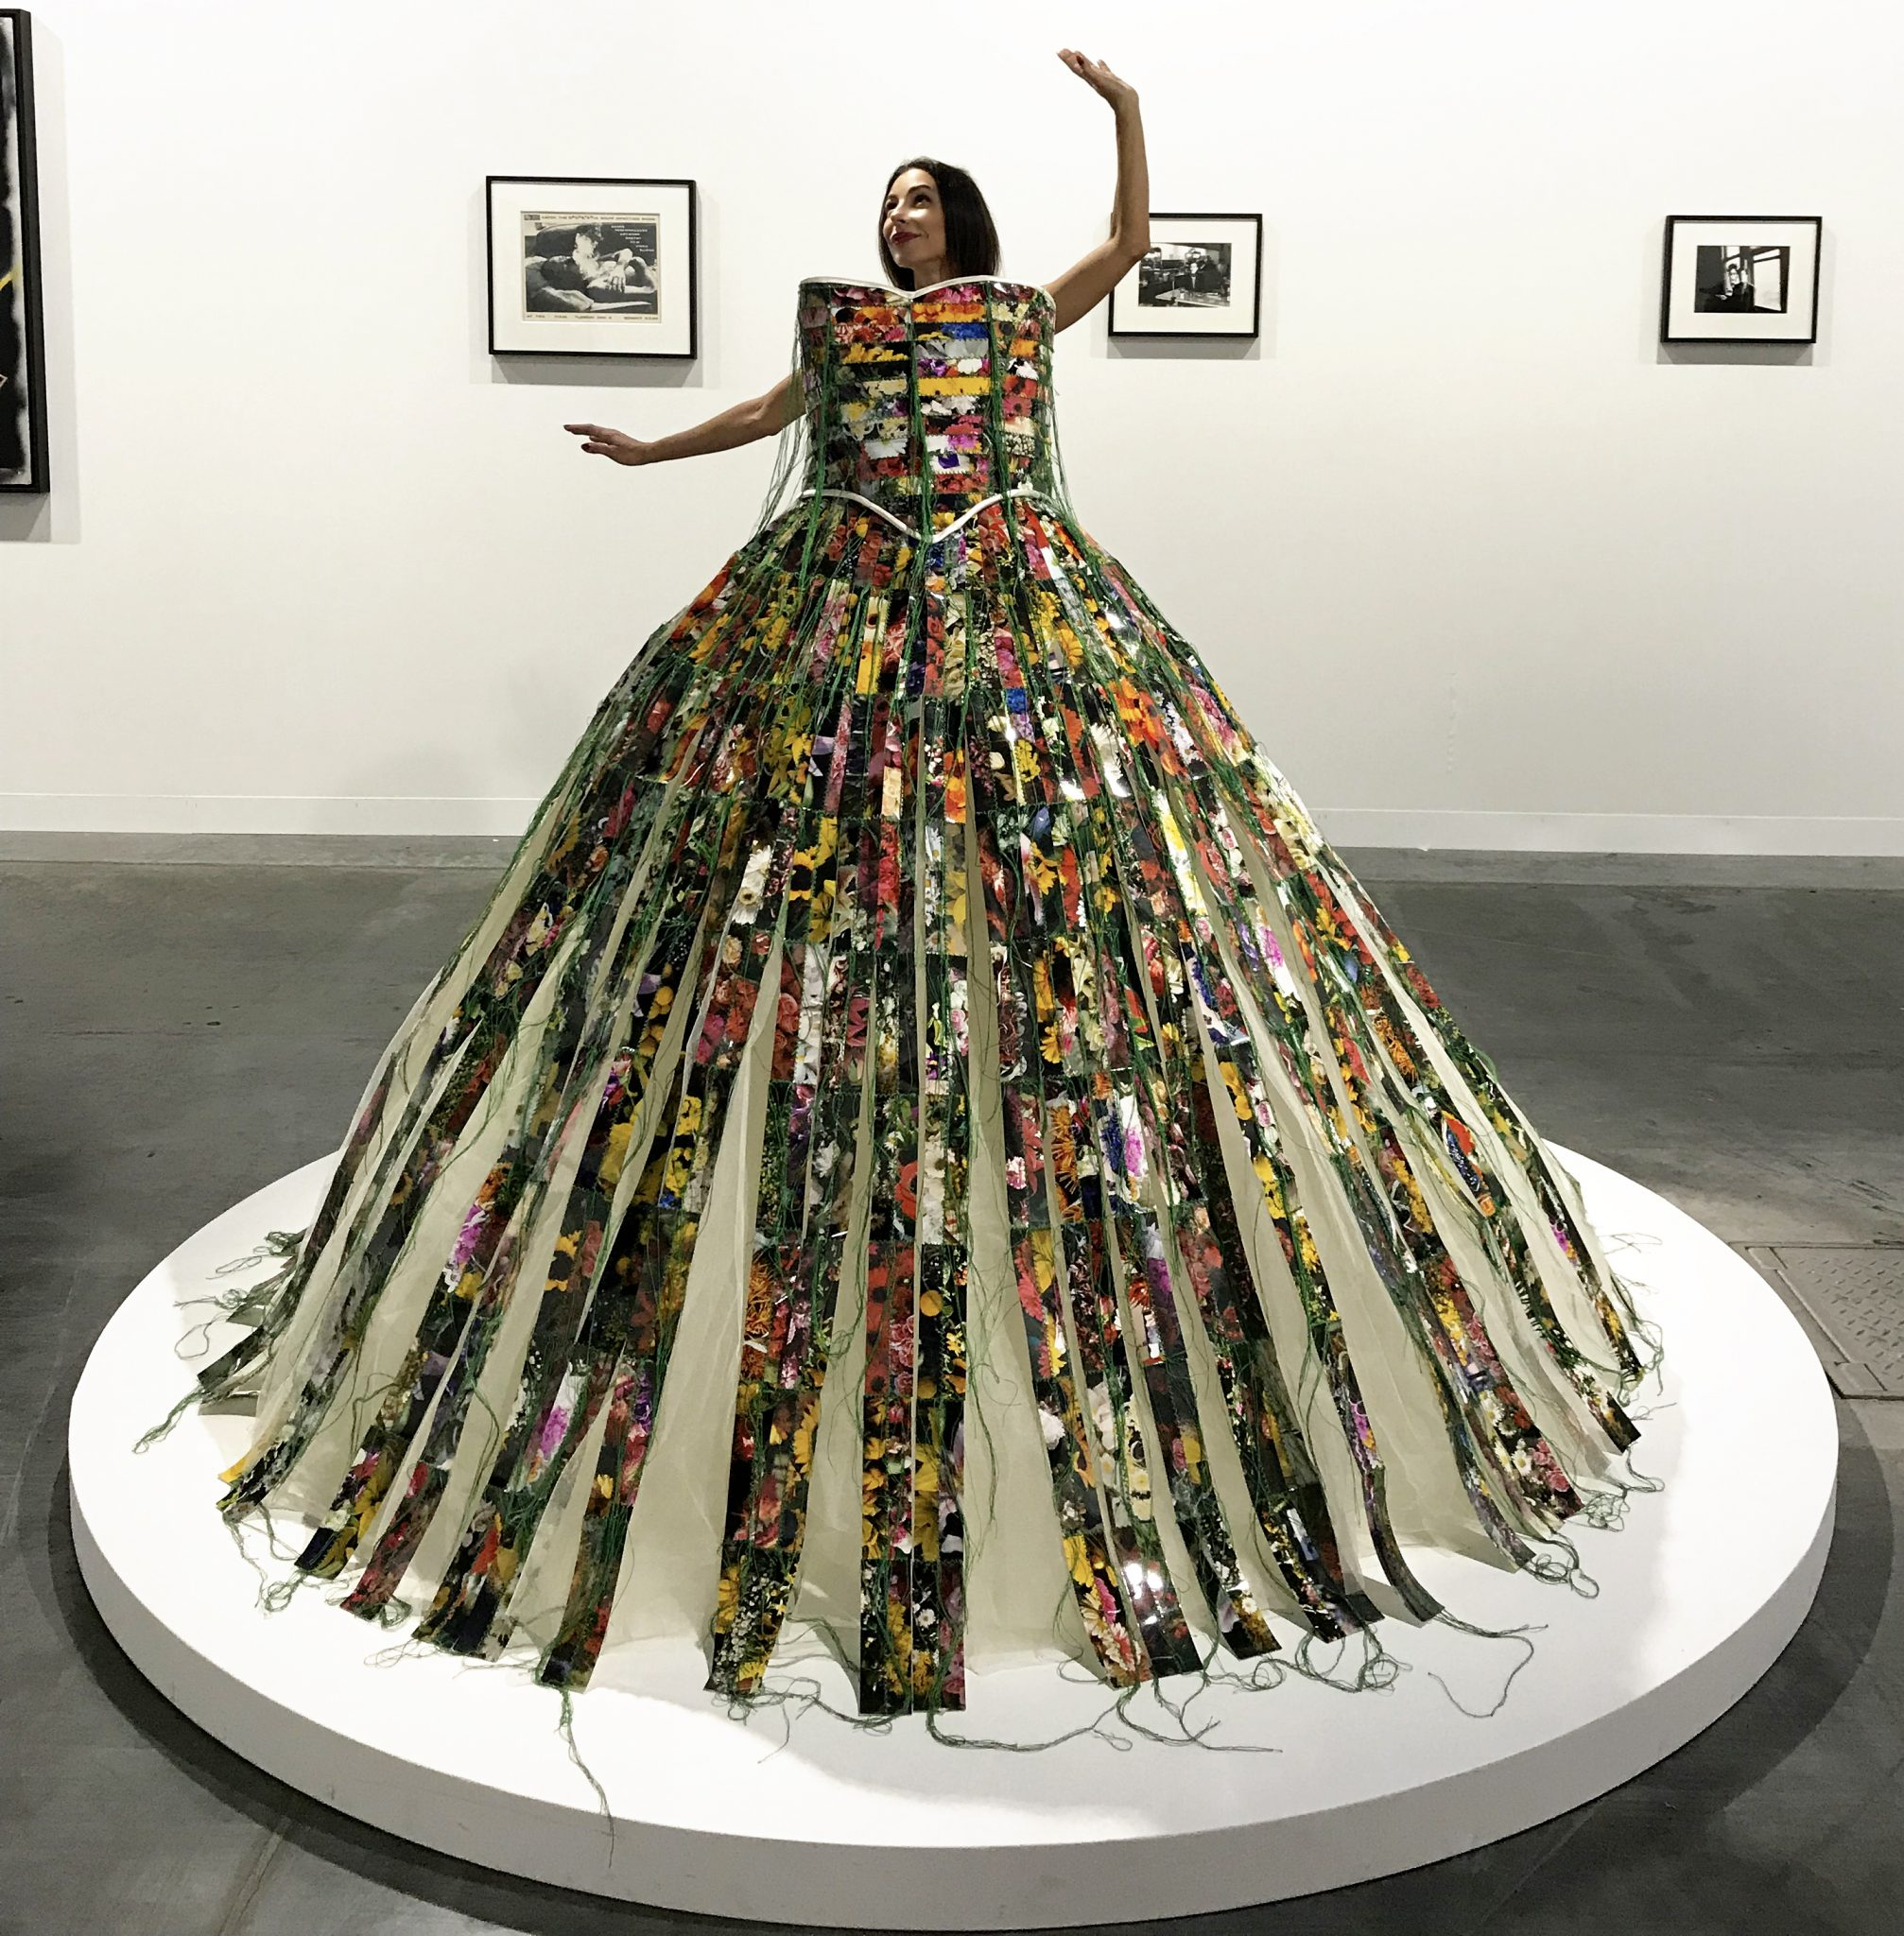 "#SELFIEADARTE ""Alta moda"" @HunterReynolds ""Mourning Dress"" 1997 P.P.O.W @P.P.O.W @ArtBasel #Miami @CleliaPatella"